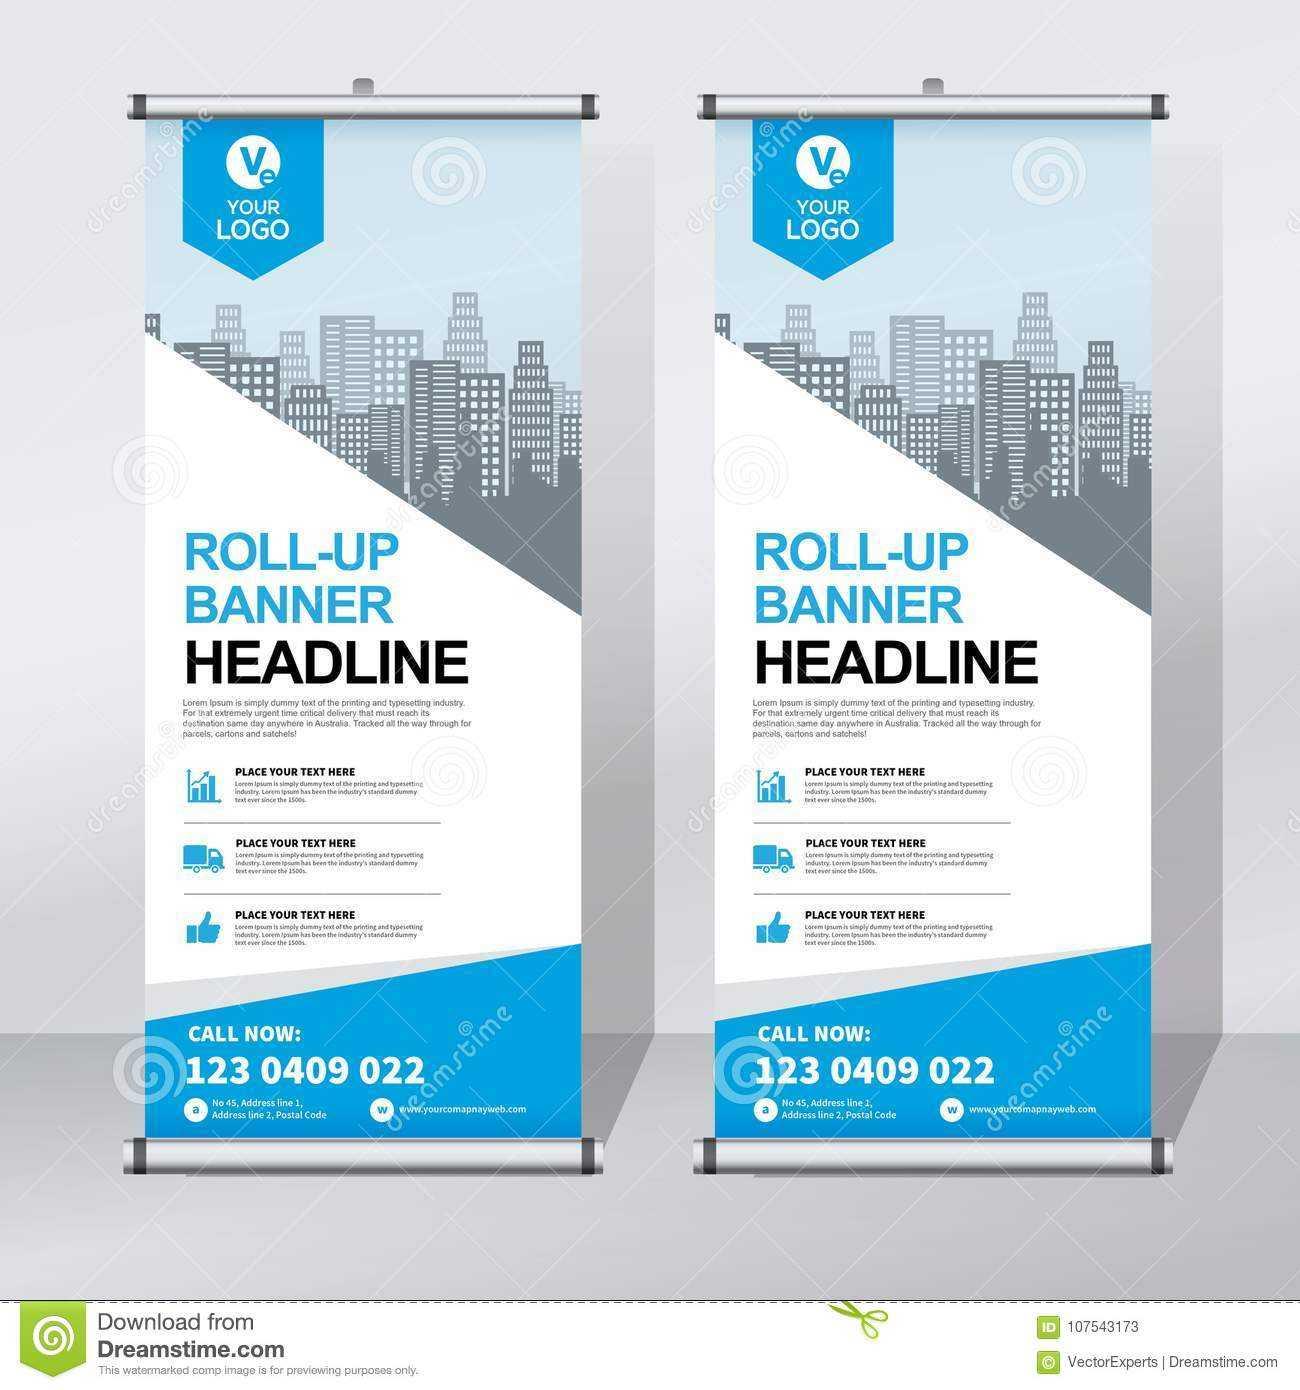 Roll Up Banner Design Template, Vertical, Abstract With Retractable Banner Design Templates